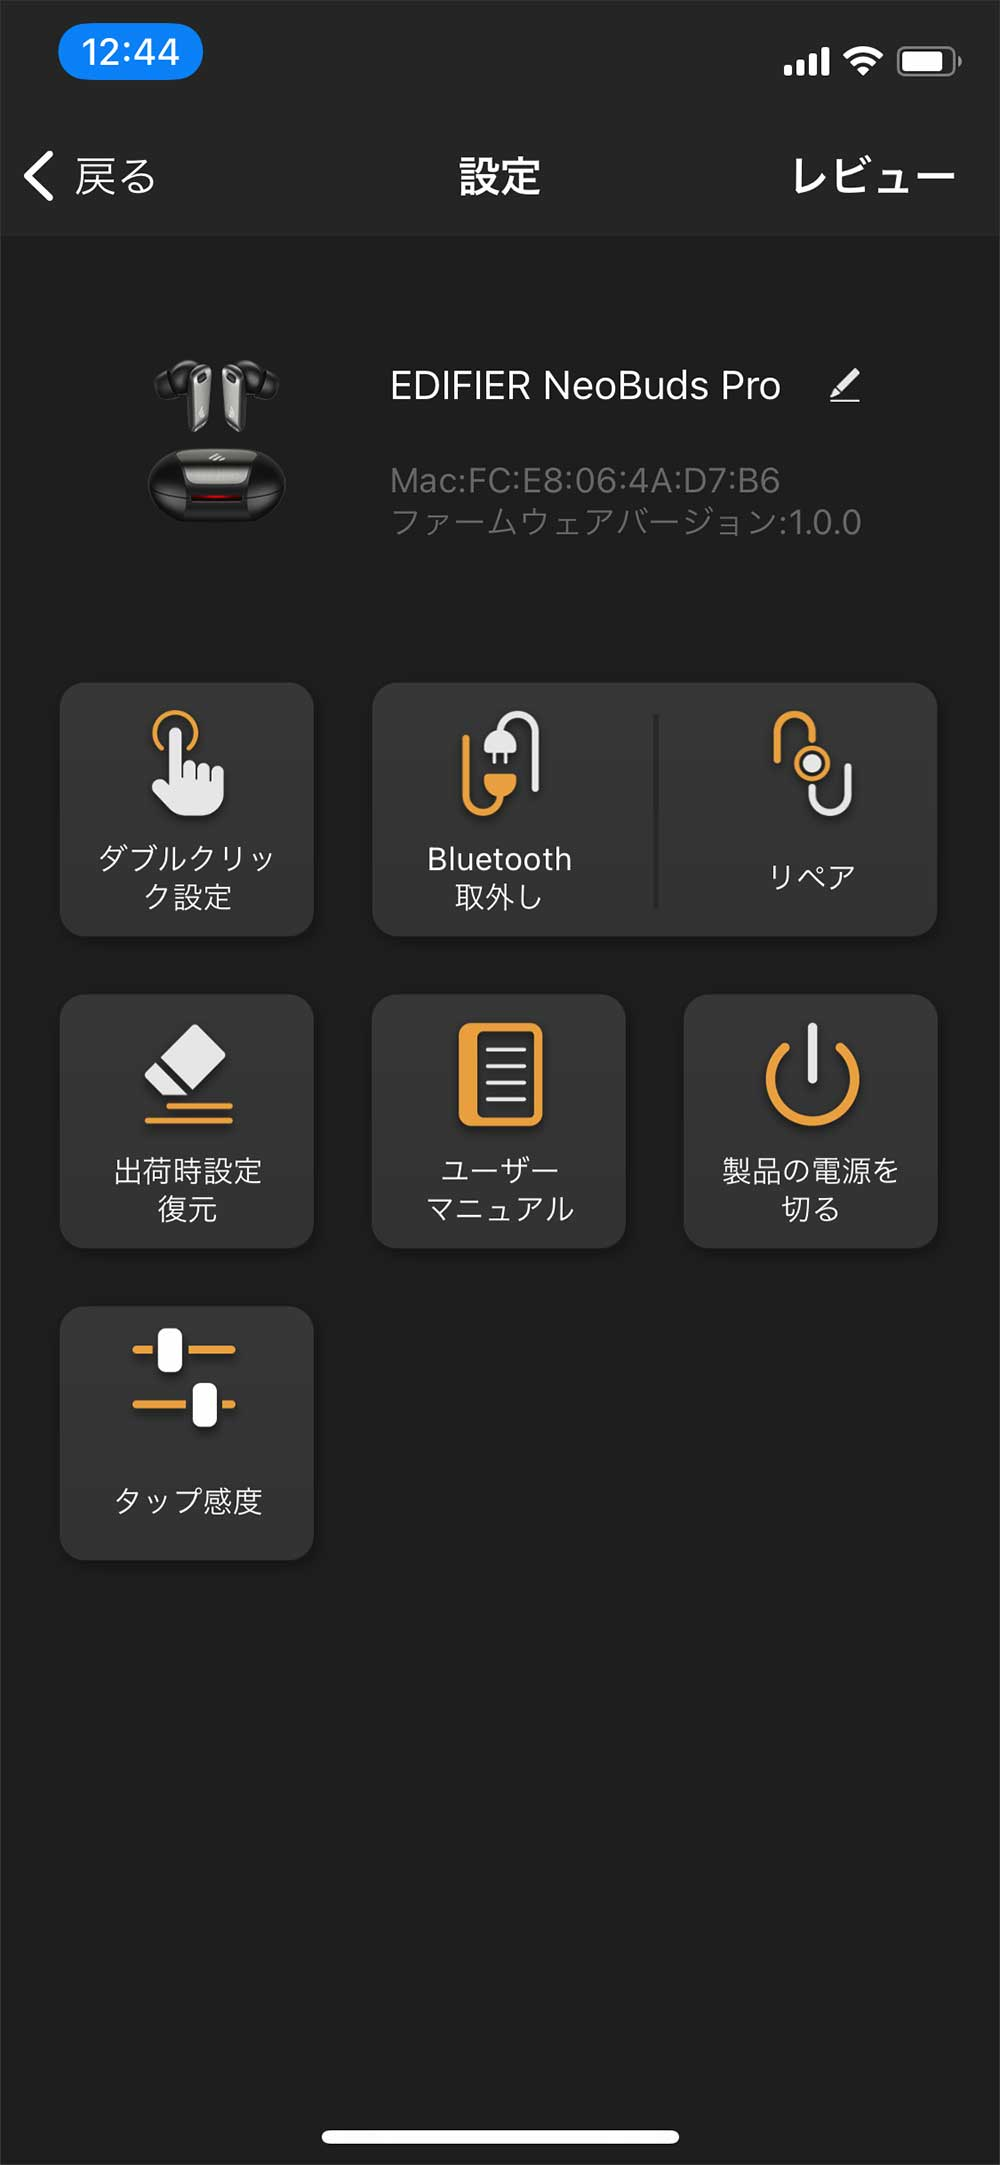 Edifier NeoBuds Pro アプリ